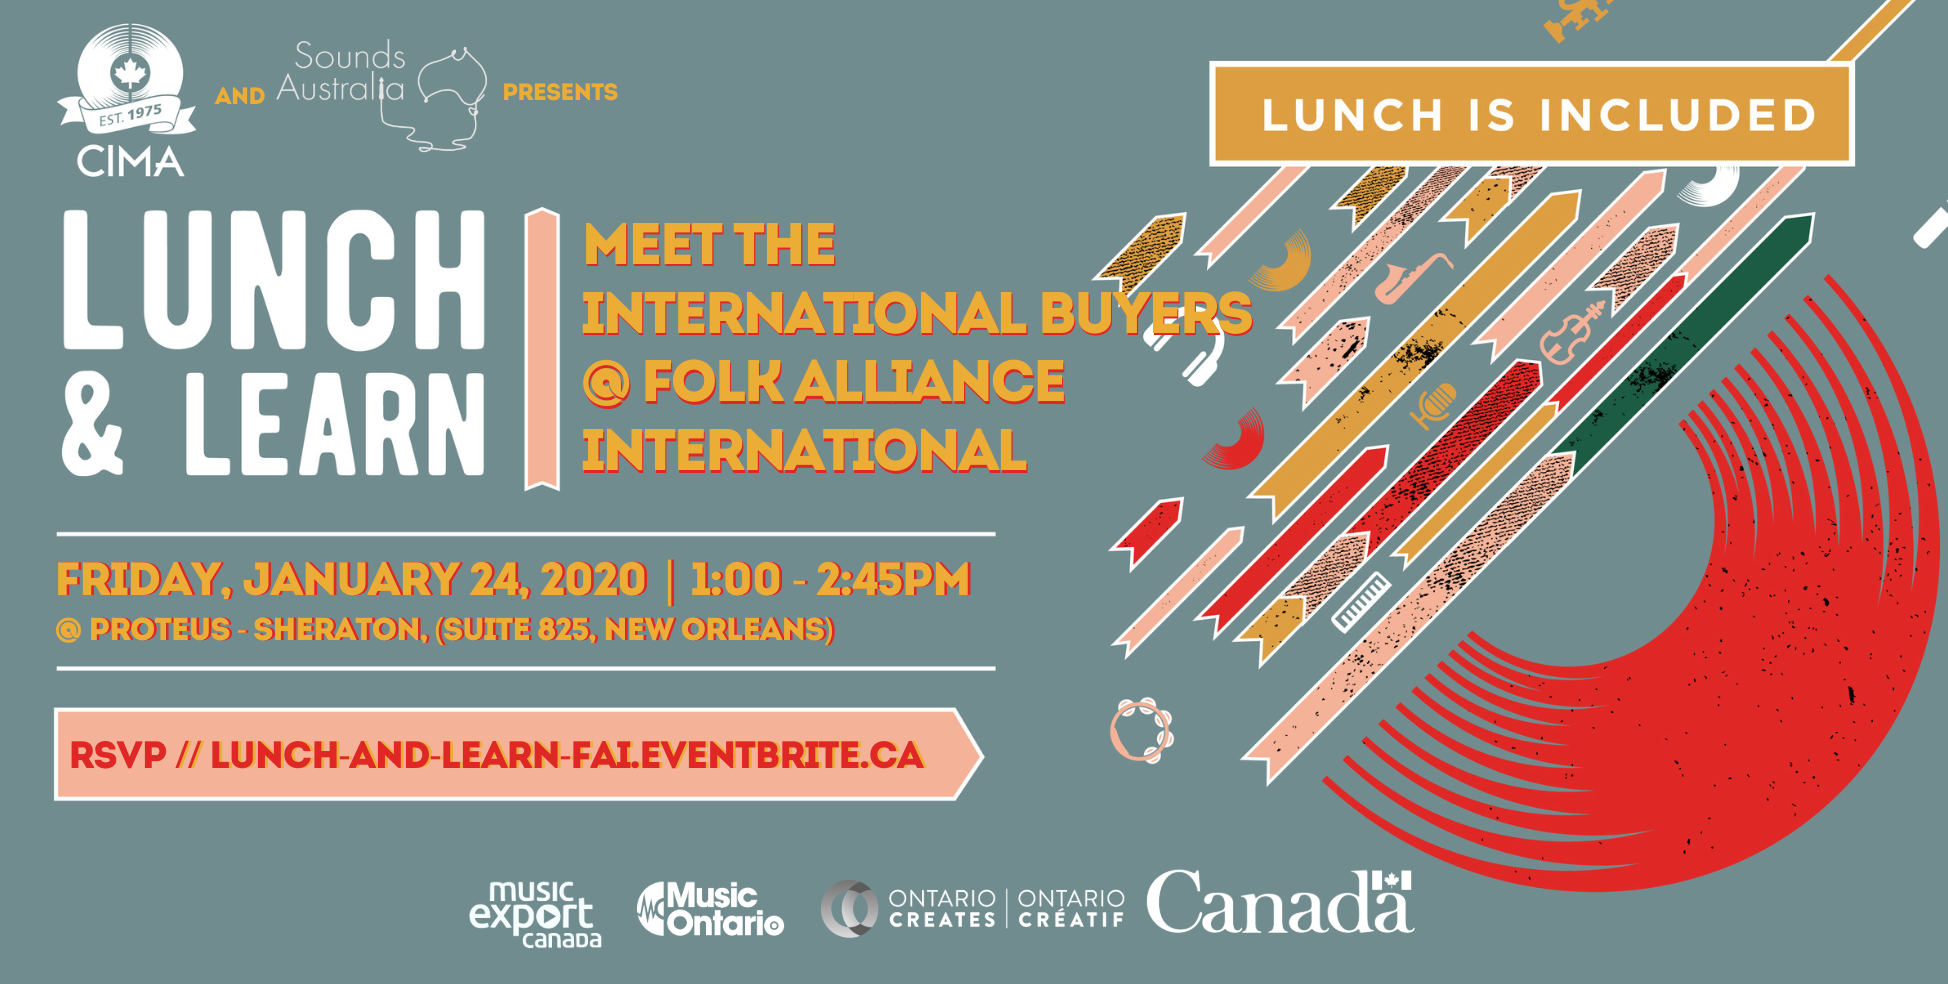 Lunch & Learn 02: Meet the International Buyers @ Folk Alliance International